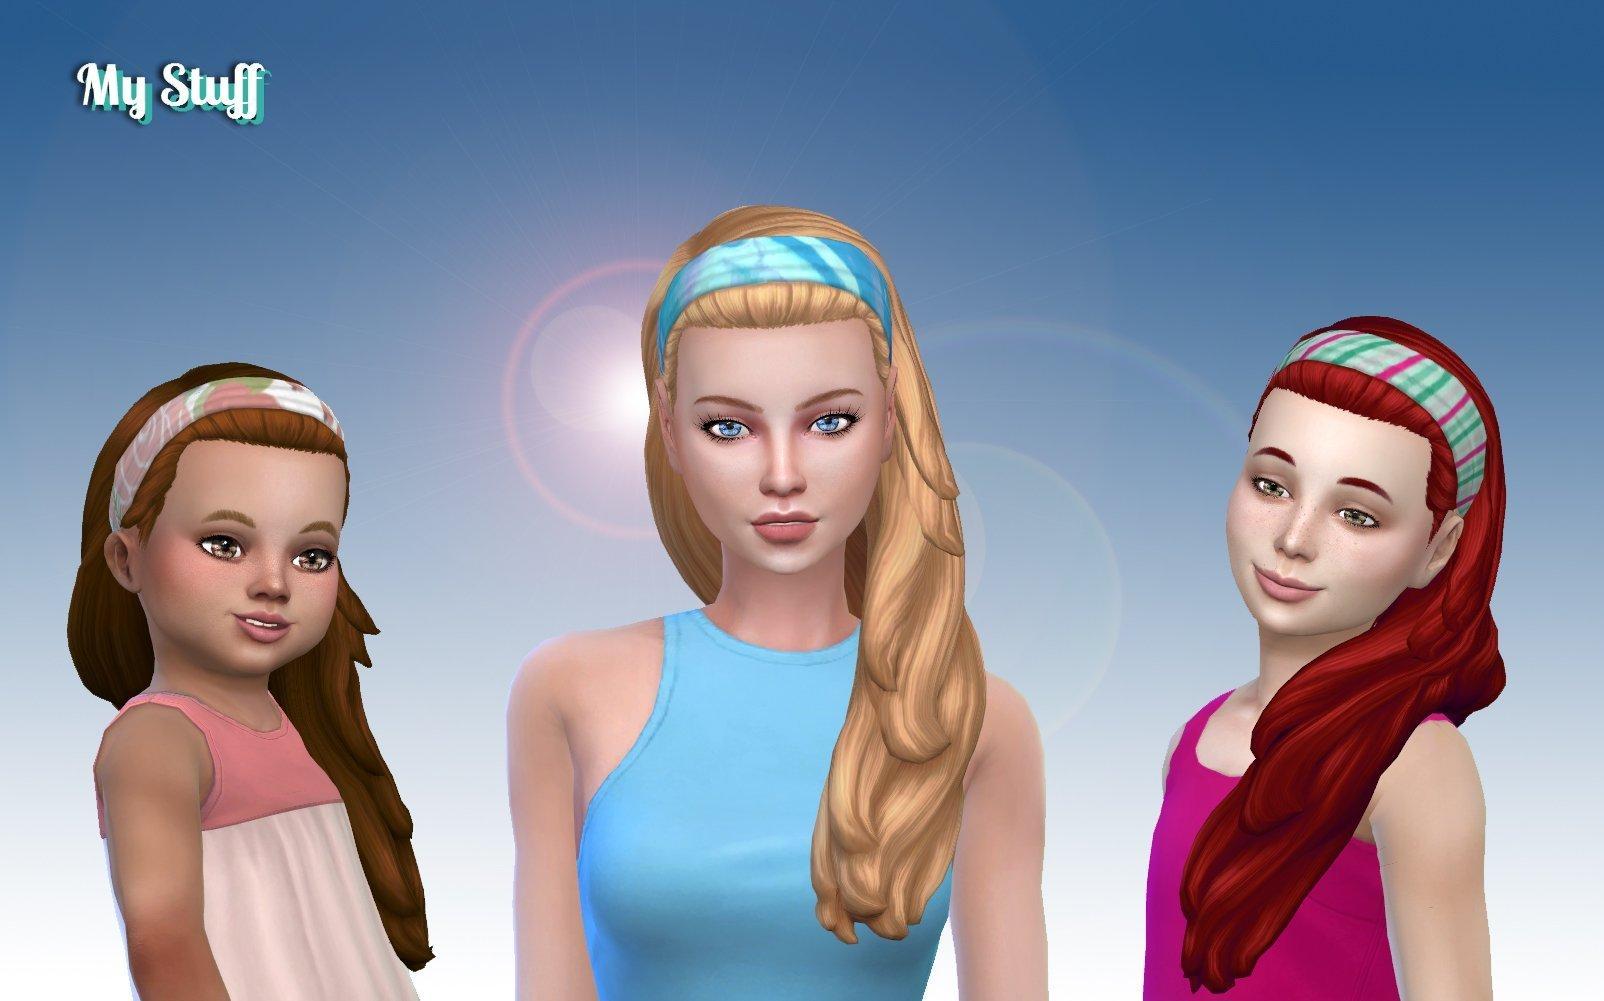 Livia Hairband Recolor